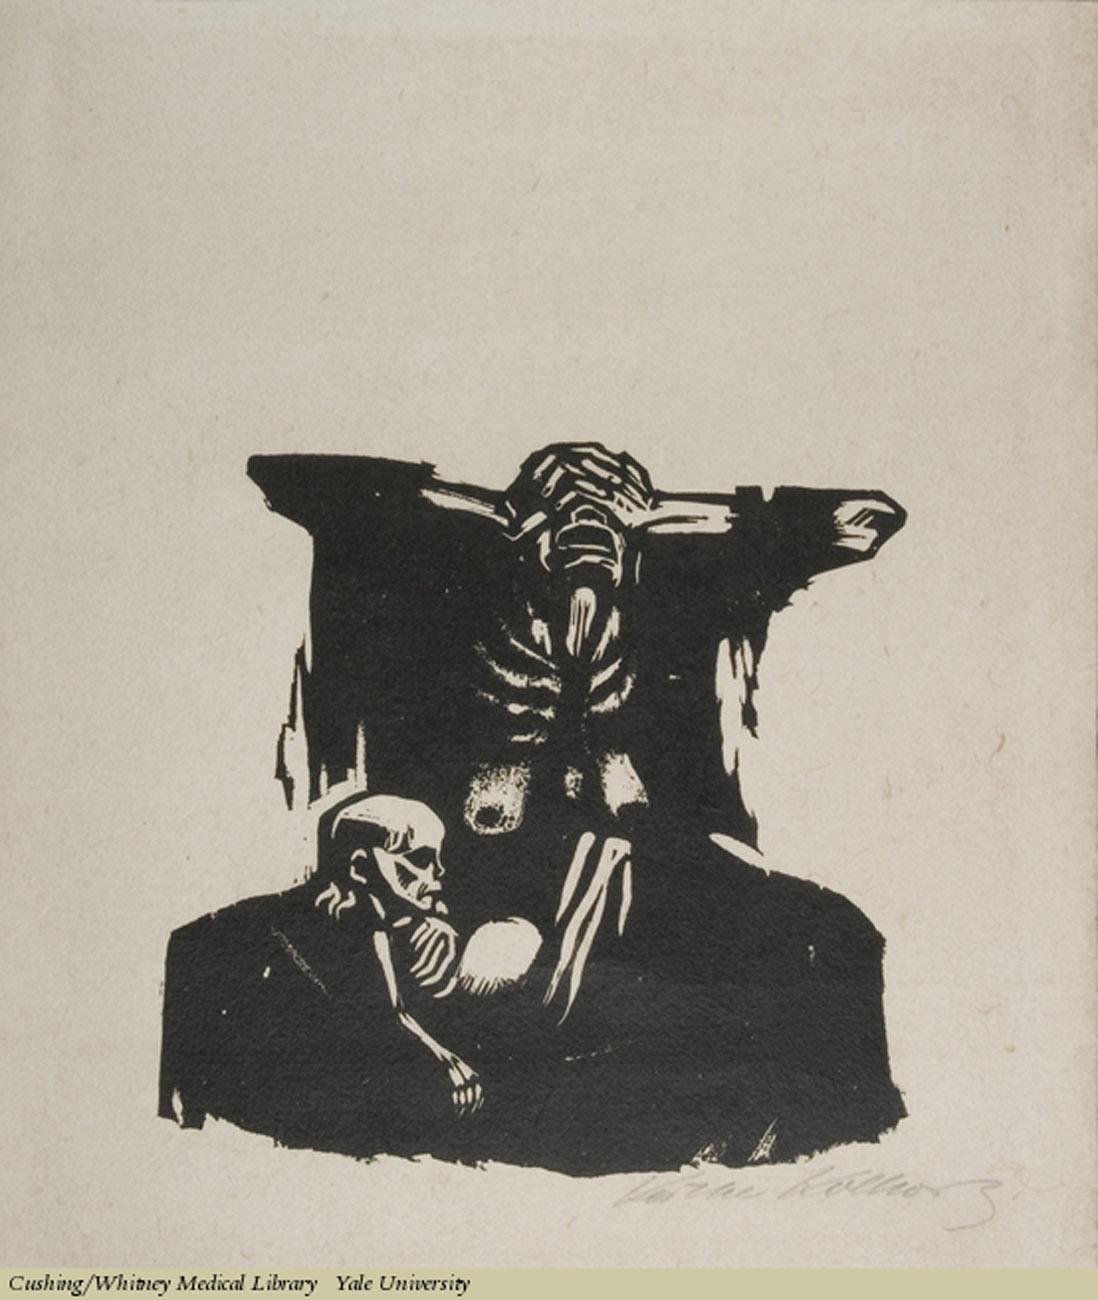 Hunger, Kathe Kollwitz,Woodcut on laid paper, 1922. Subject: Hunger, Malnutrition.